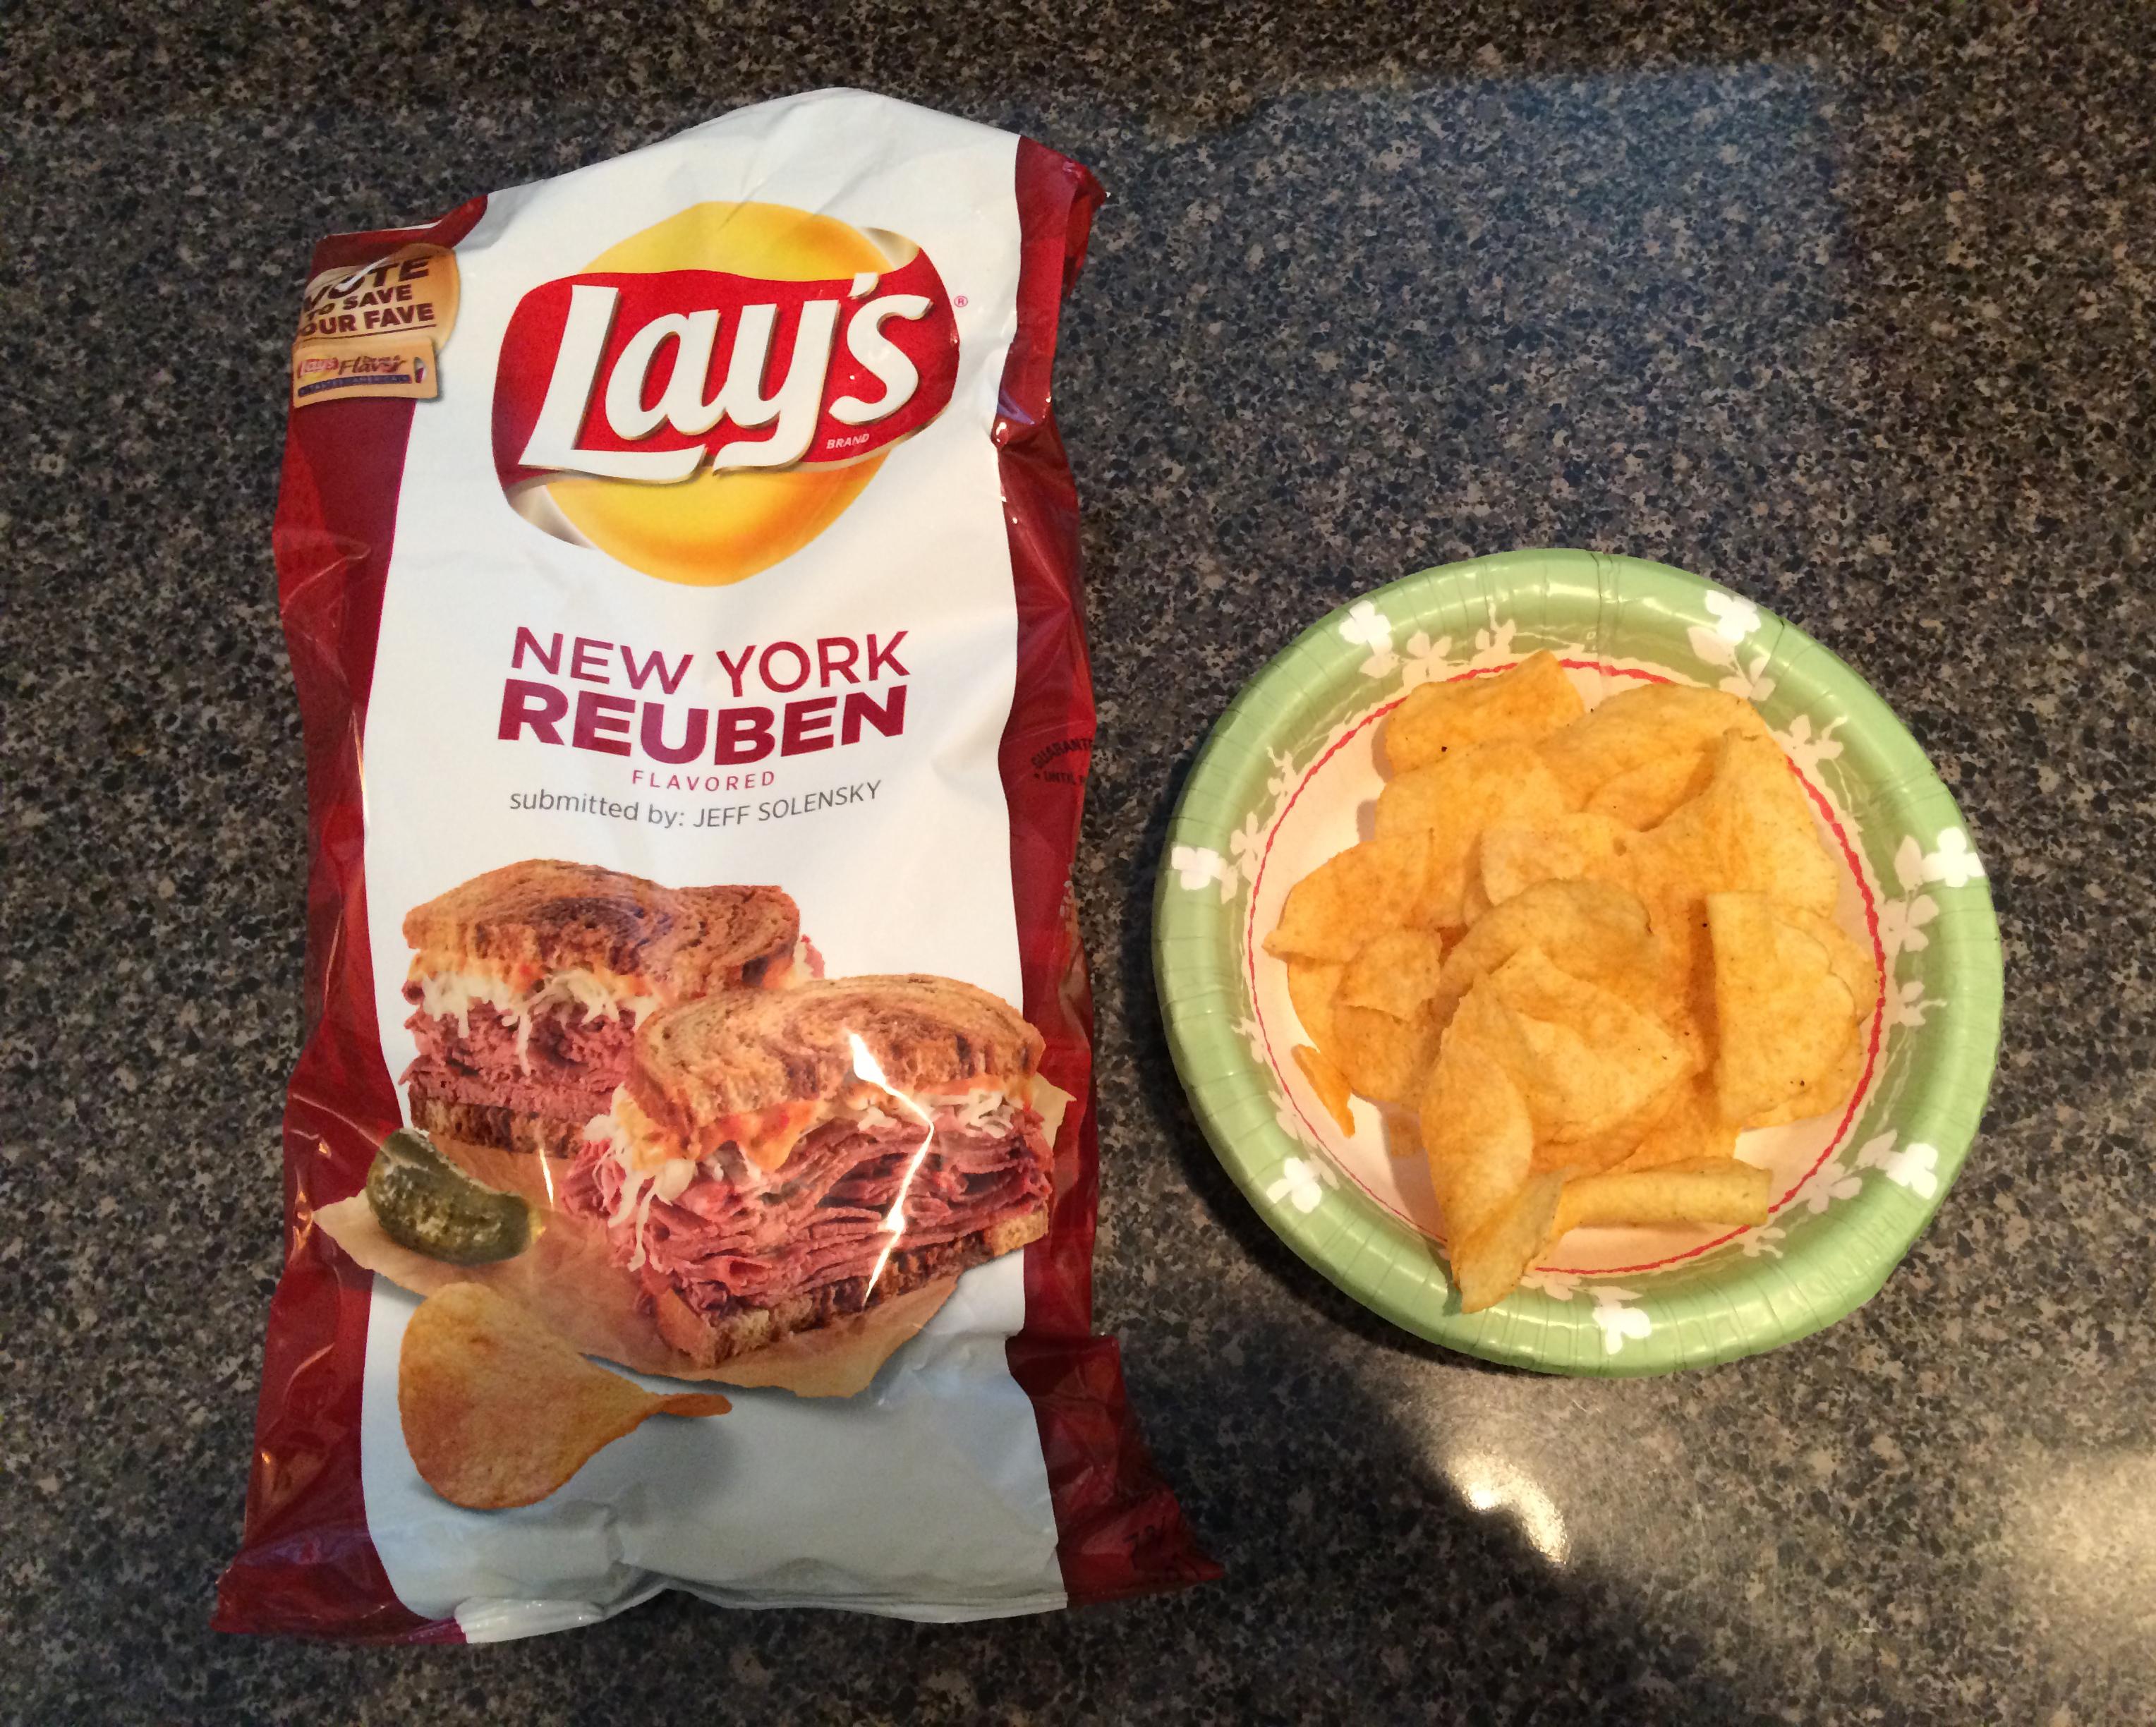 The #DoUsAFlavor New York Reuben chips had a slight tomato sauce taste to me.